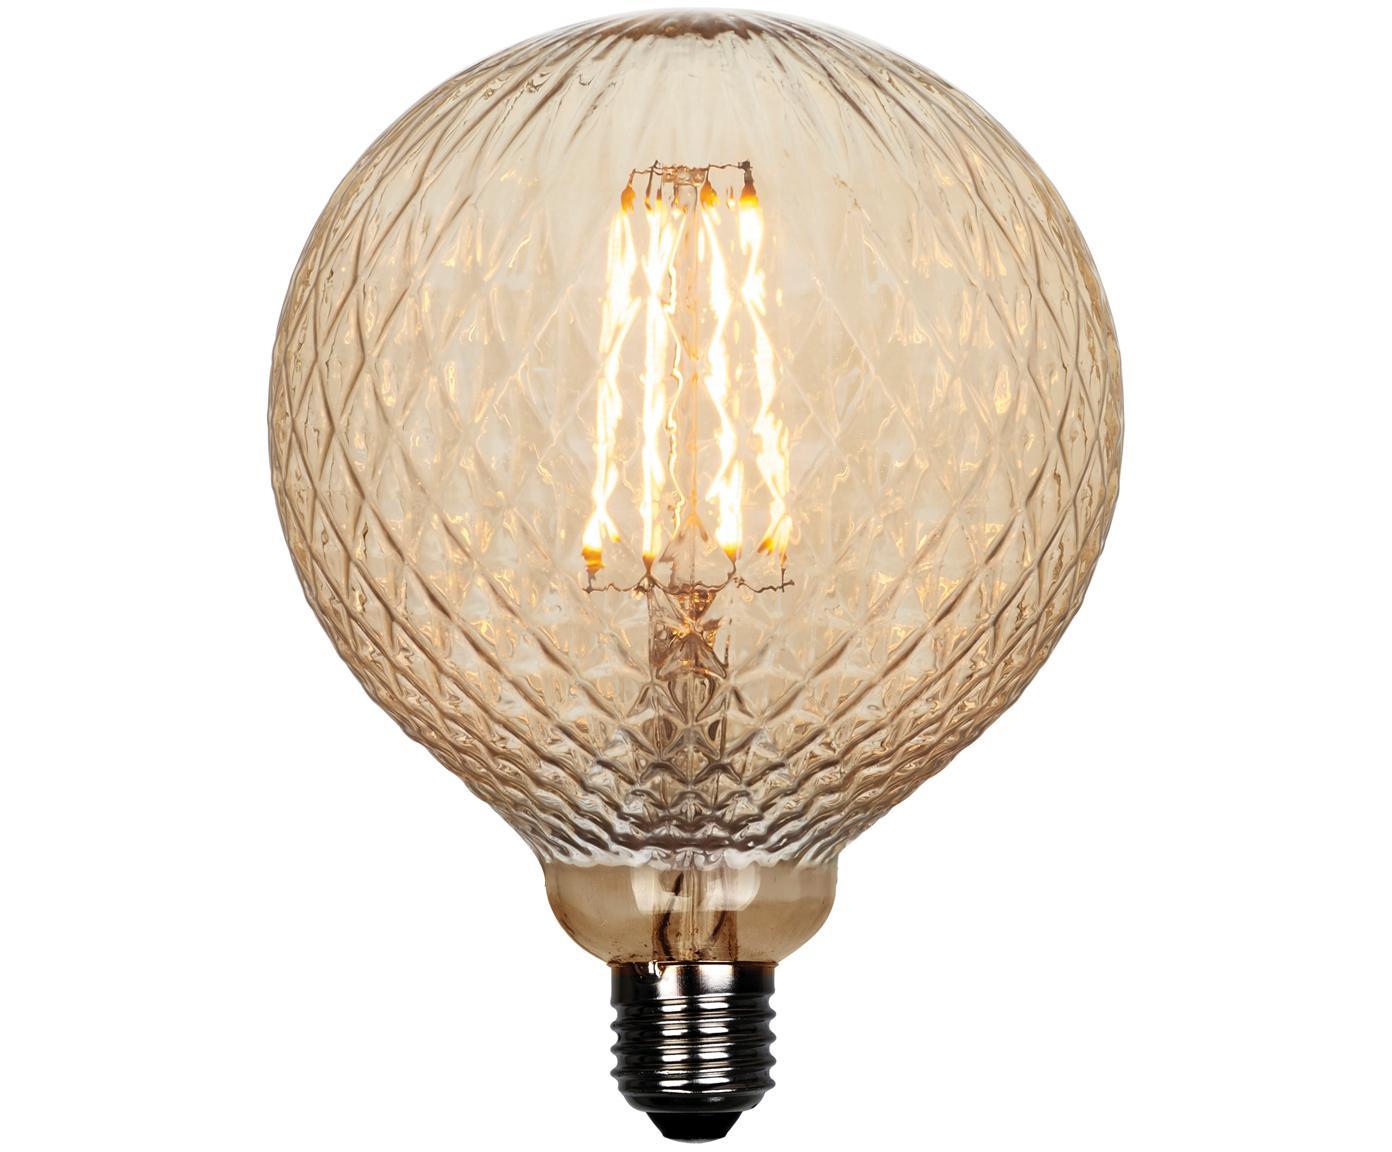 Lampadina a LED XL Facet (E27 / 2Watt), Lampadina: vetro, Beige, alluminio, Ø 13 x Alt. 19 cm